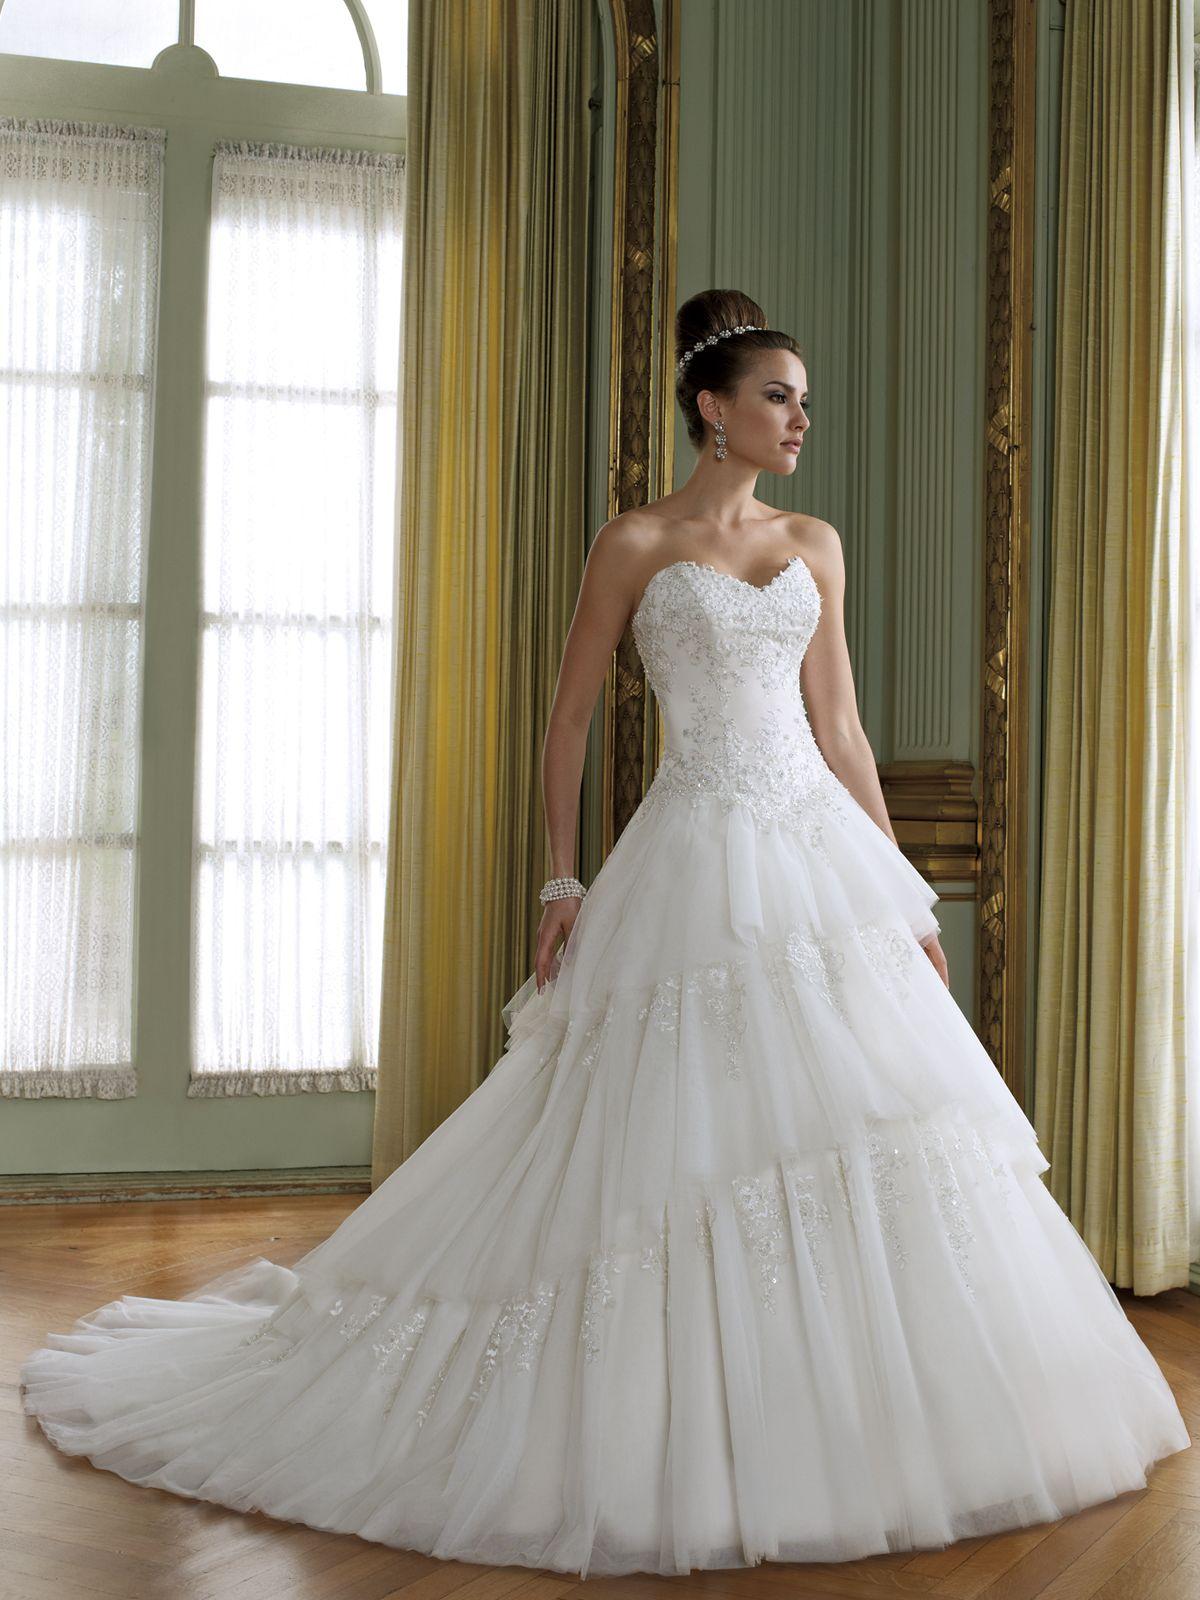 Ariel Wedding Dress David Tutera Sweetheart Wedding Dress Mon Cheri Wedding Dresses Sweetheart Bridal Gown,Chiffon Maxi Black Maxi Dress Pakistani Wedding